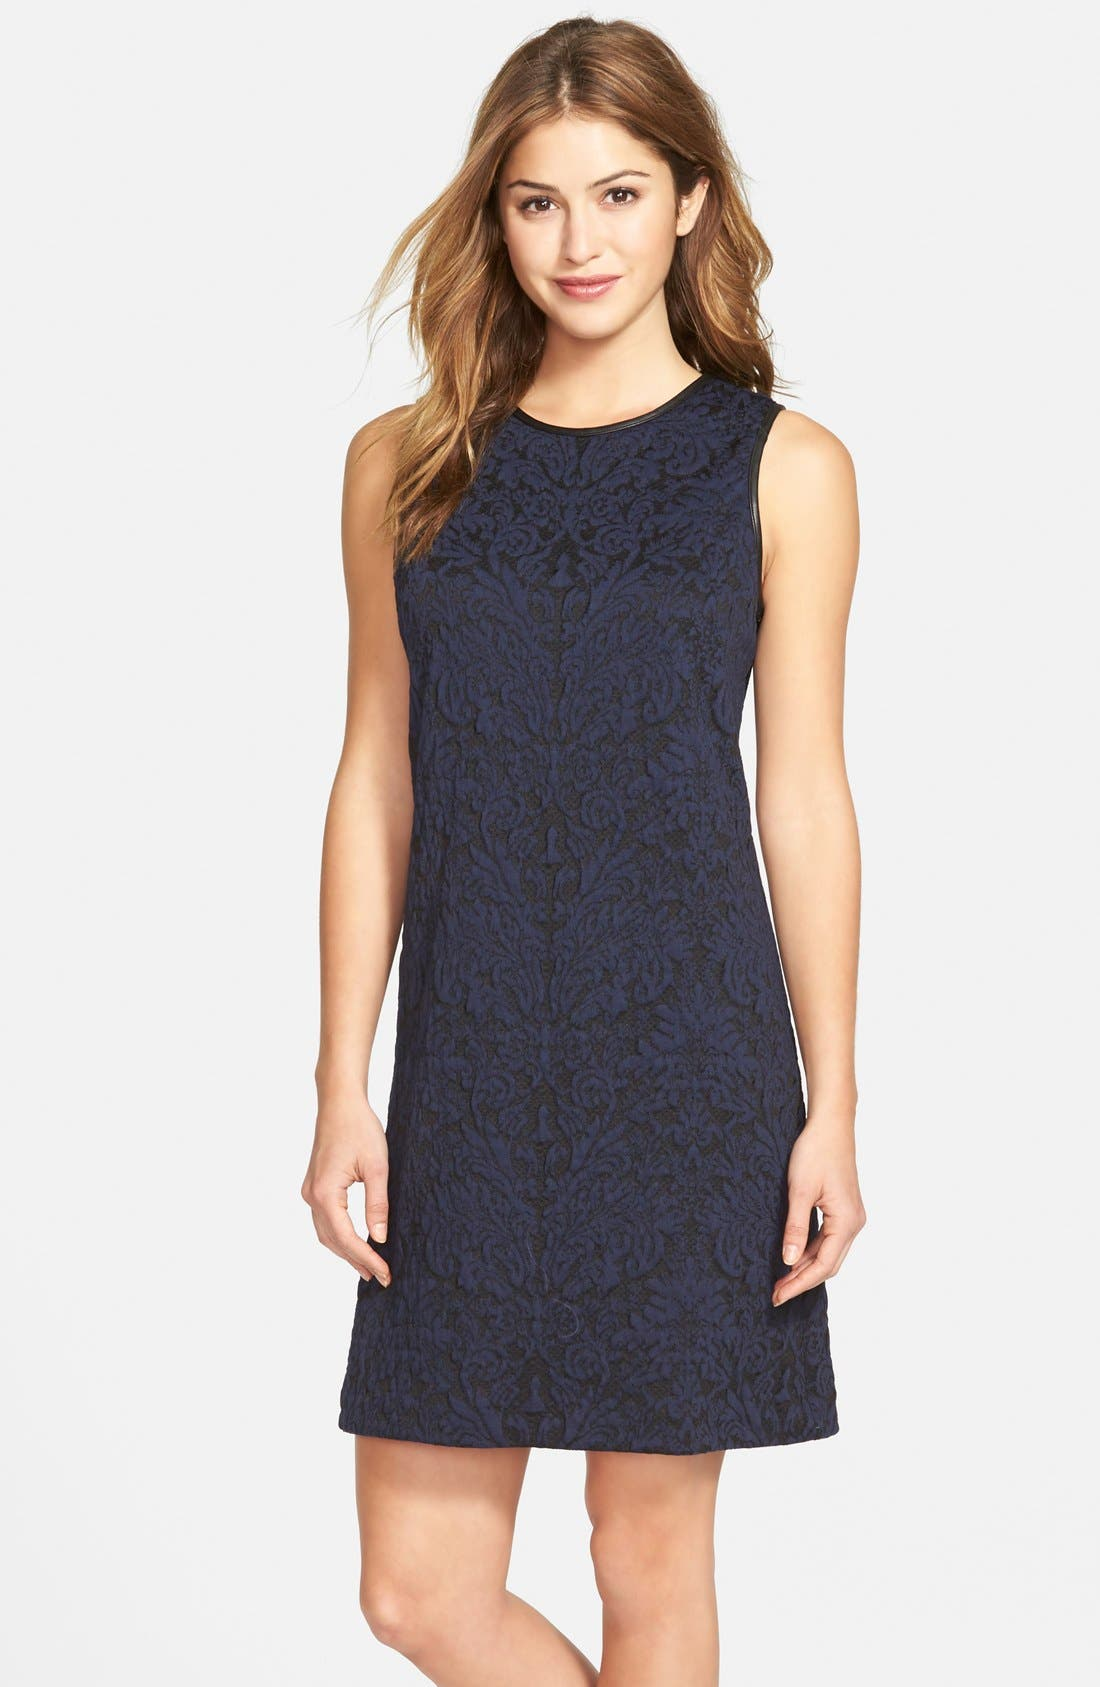 Alternate Image 1 Selected - Vince Camuto Cotton Blend Jacquard A-Line Dress